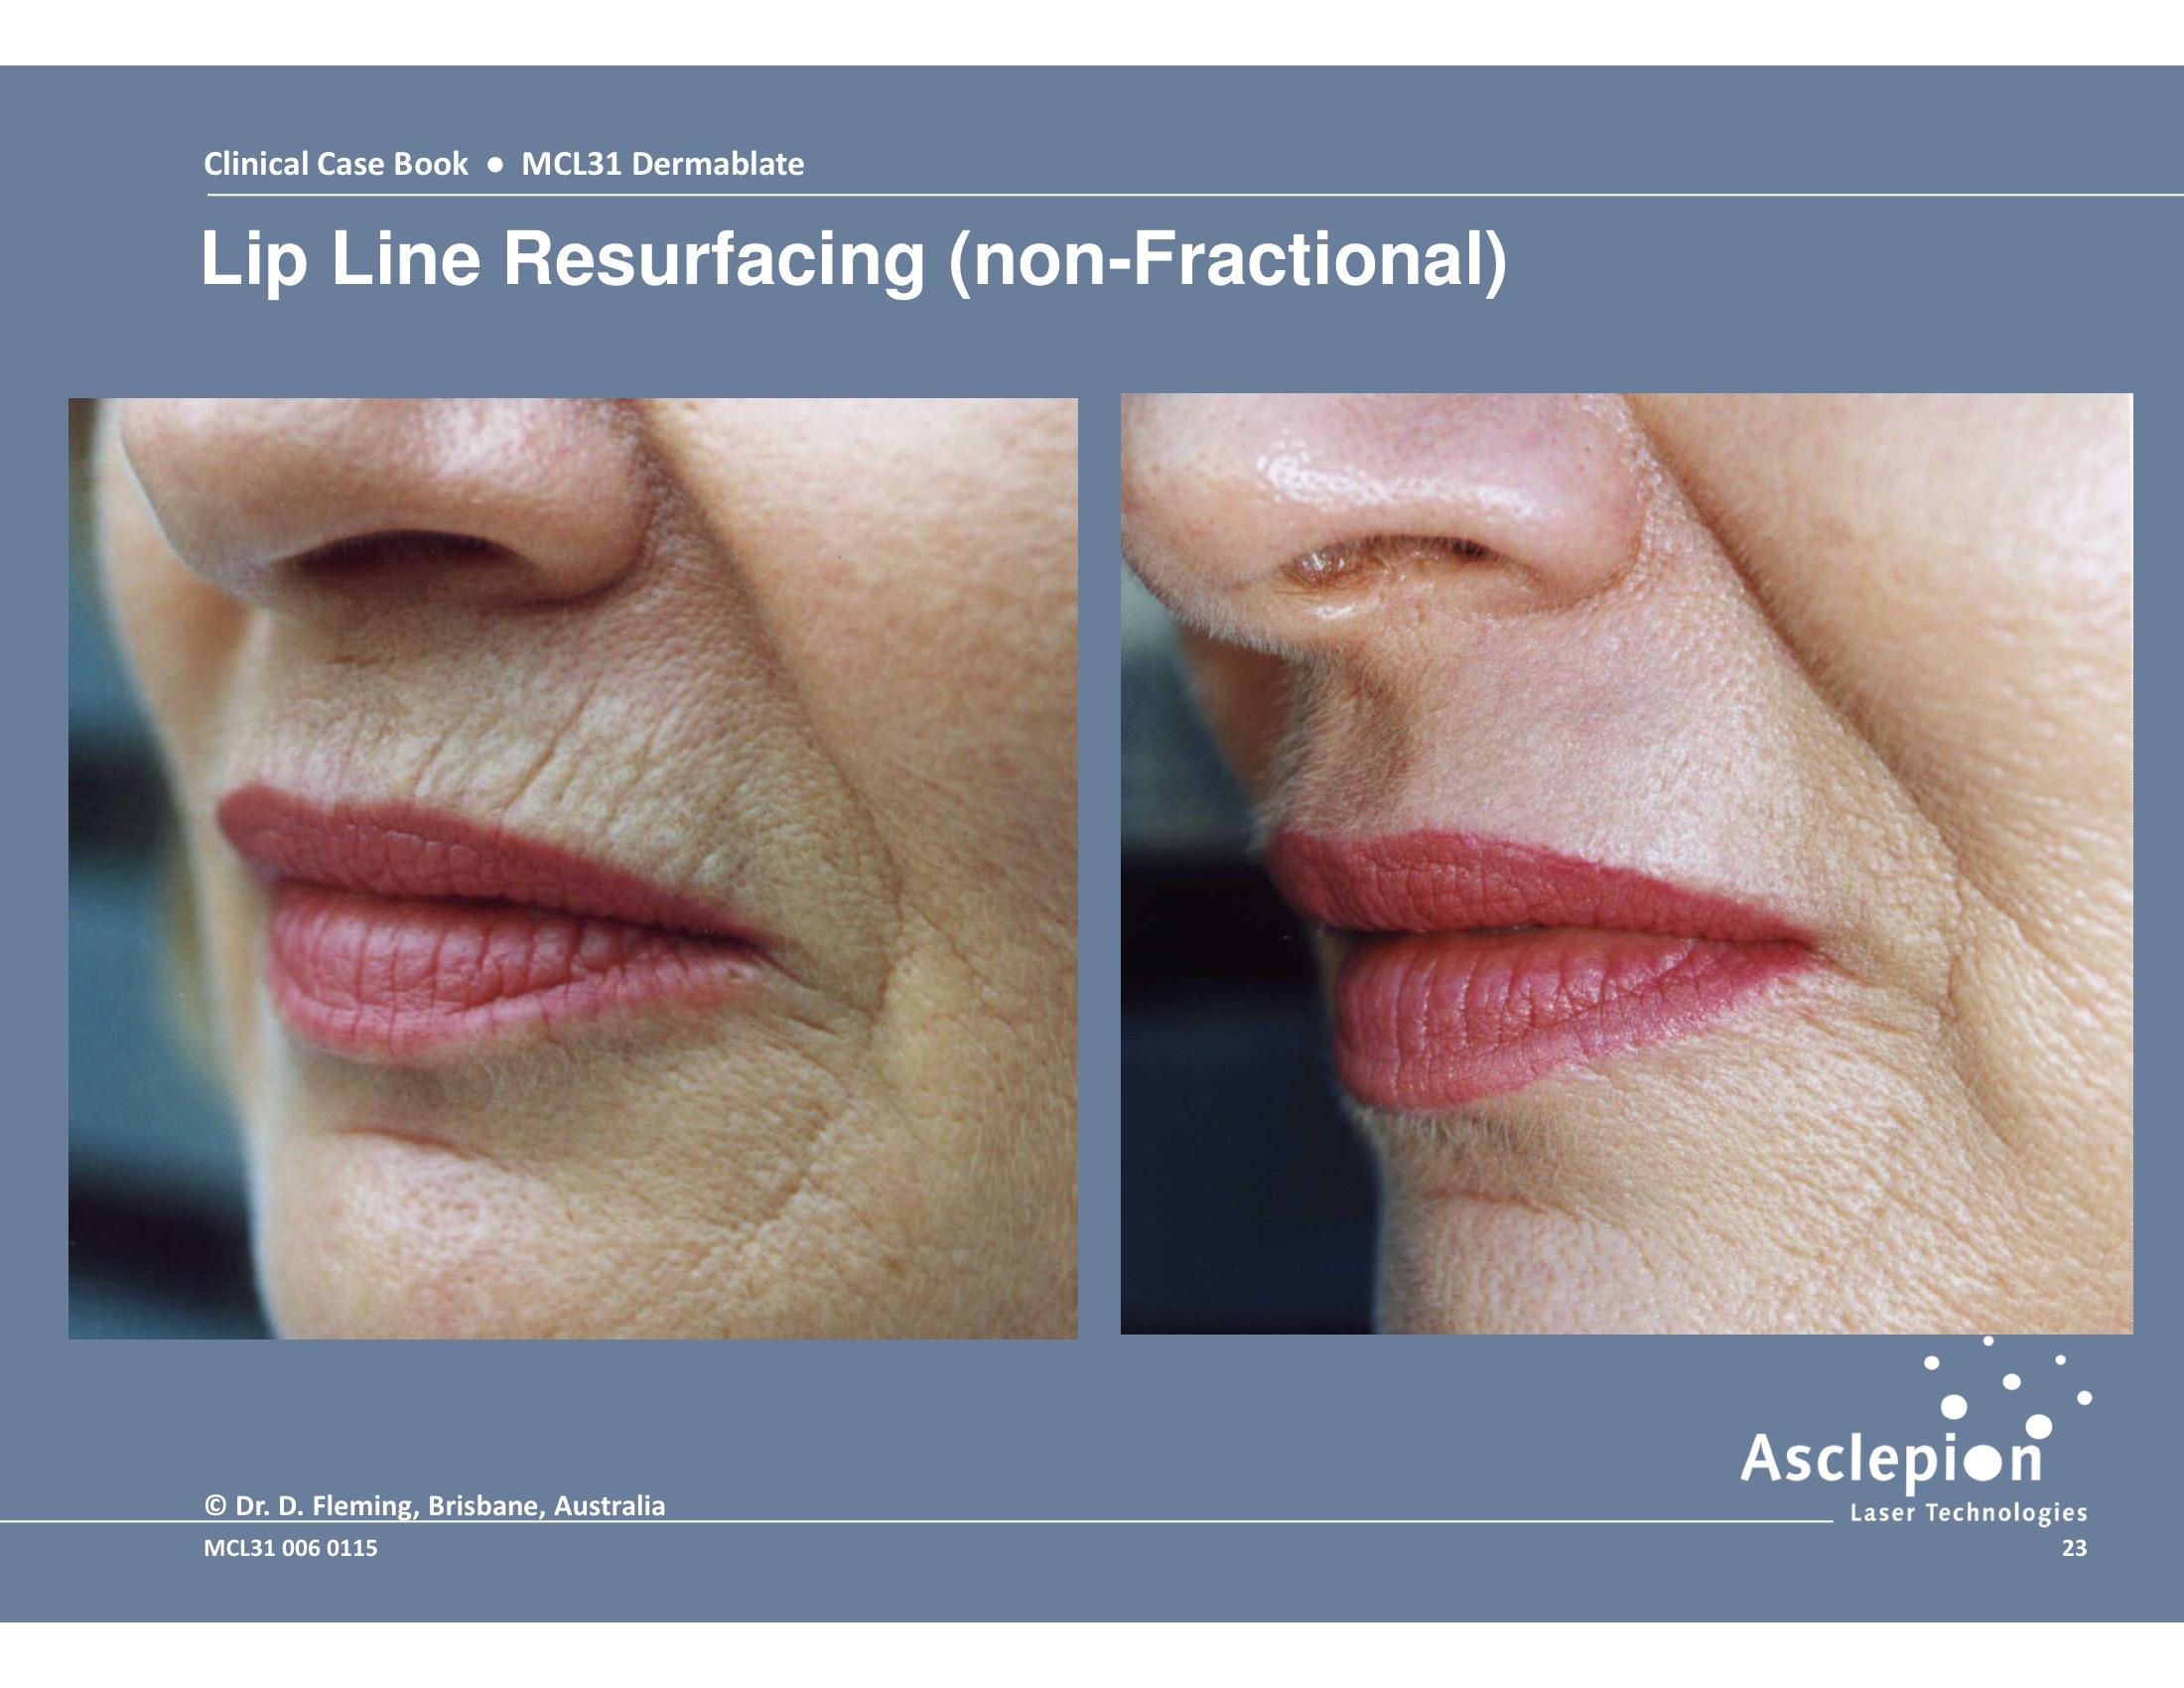 MCL 31 DERMABLATE Erbium Laser Skin Resurfacing